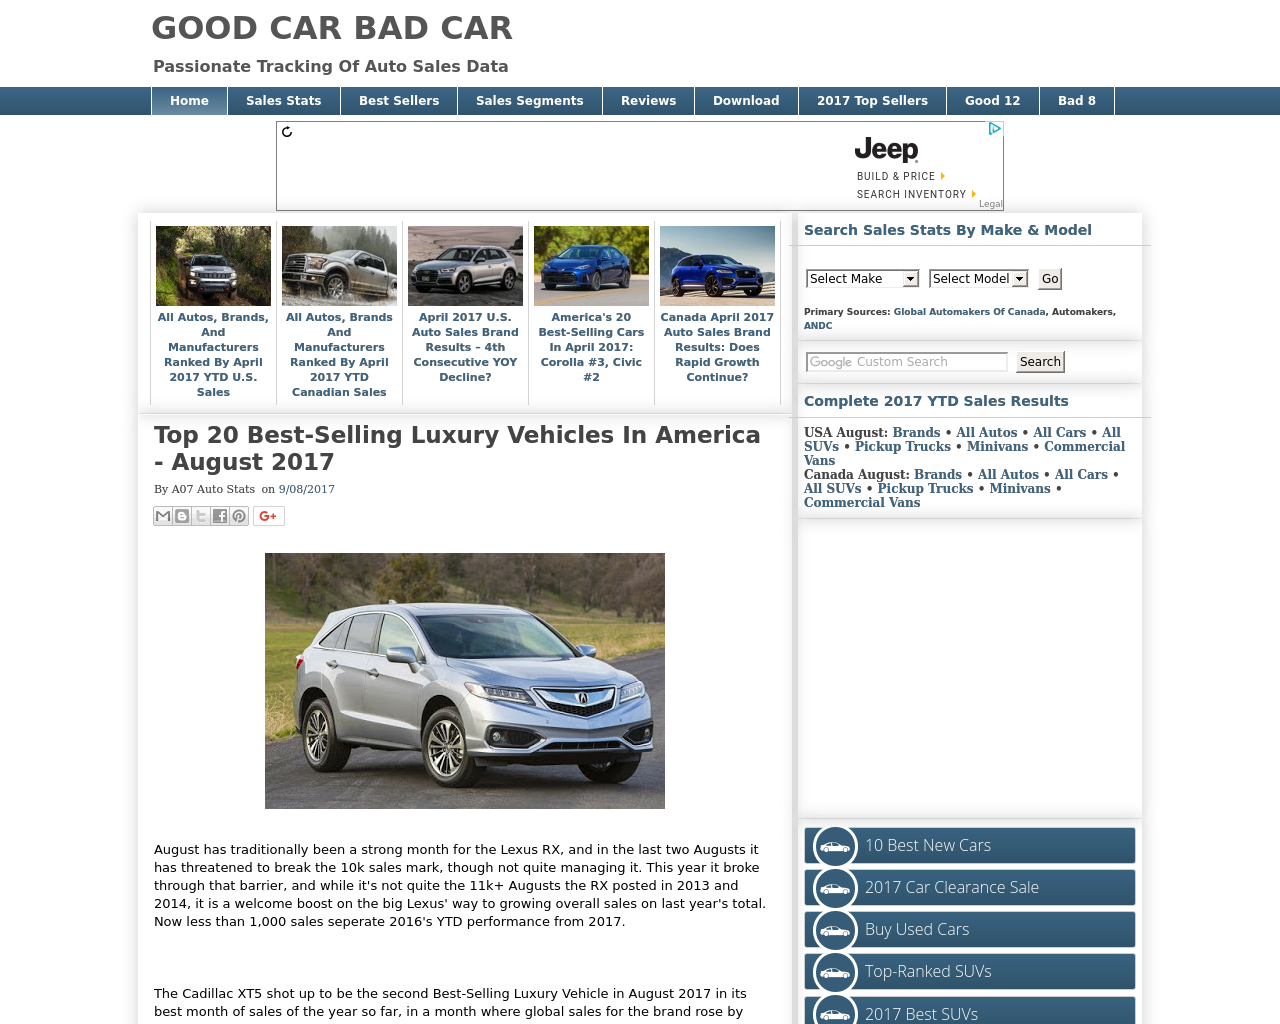 GoodCarBadCar-Advertising-Reviews-Pricing